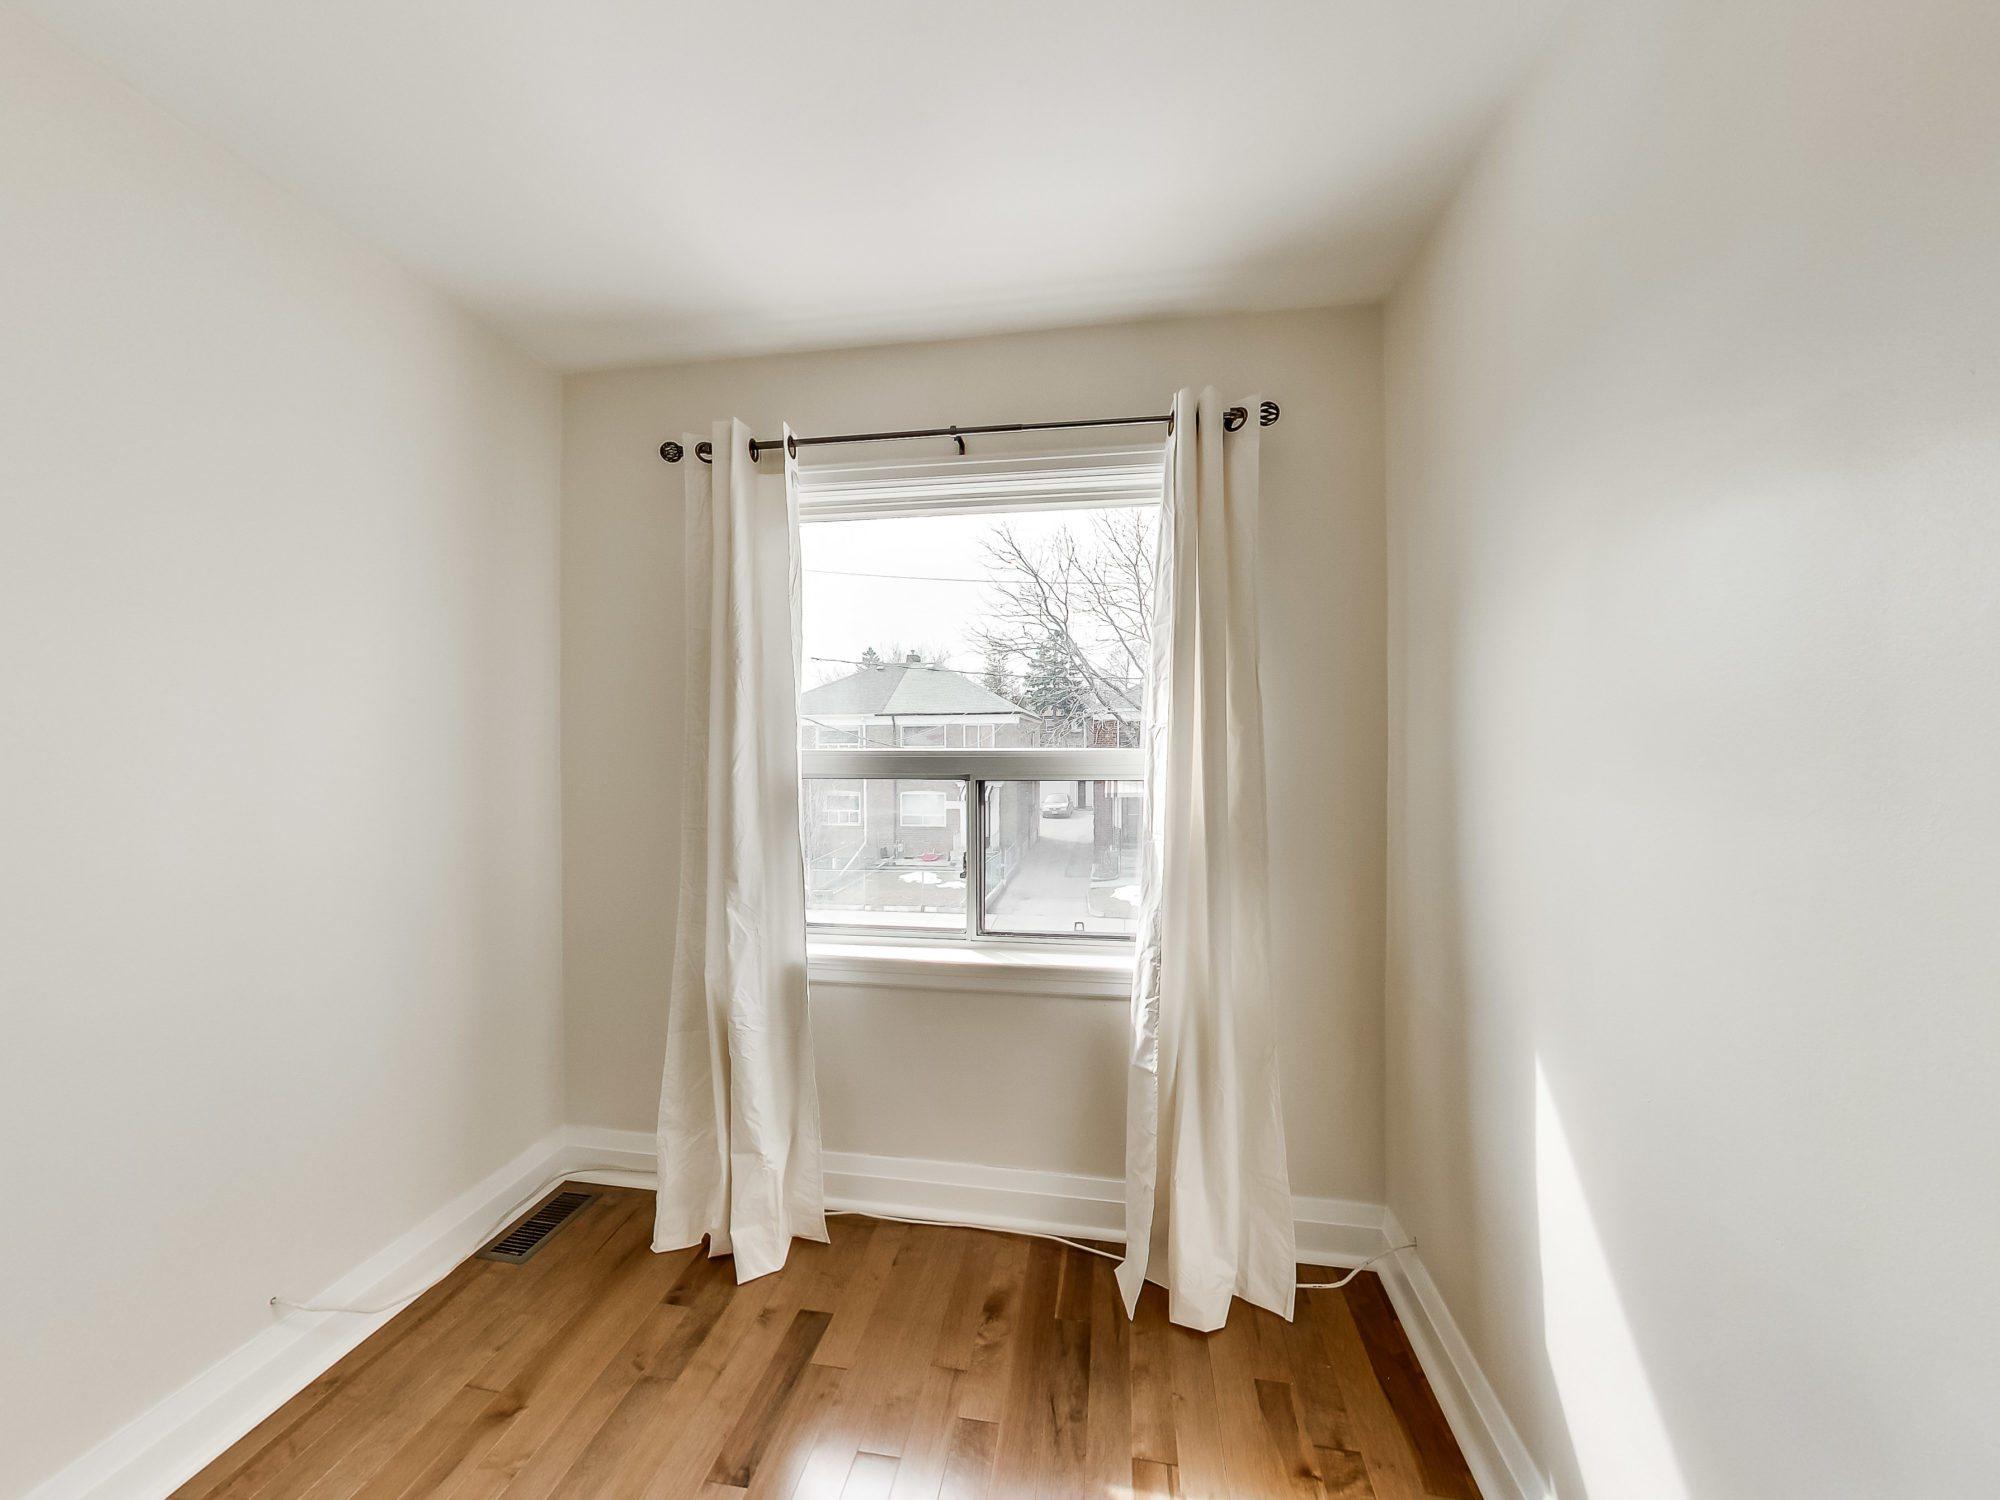 toronto-house-sold-71-hertle-avenue-7